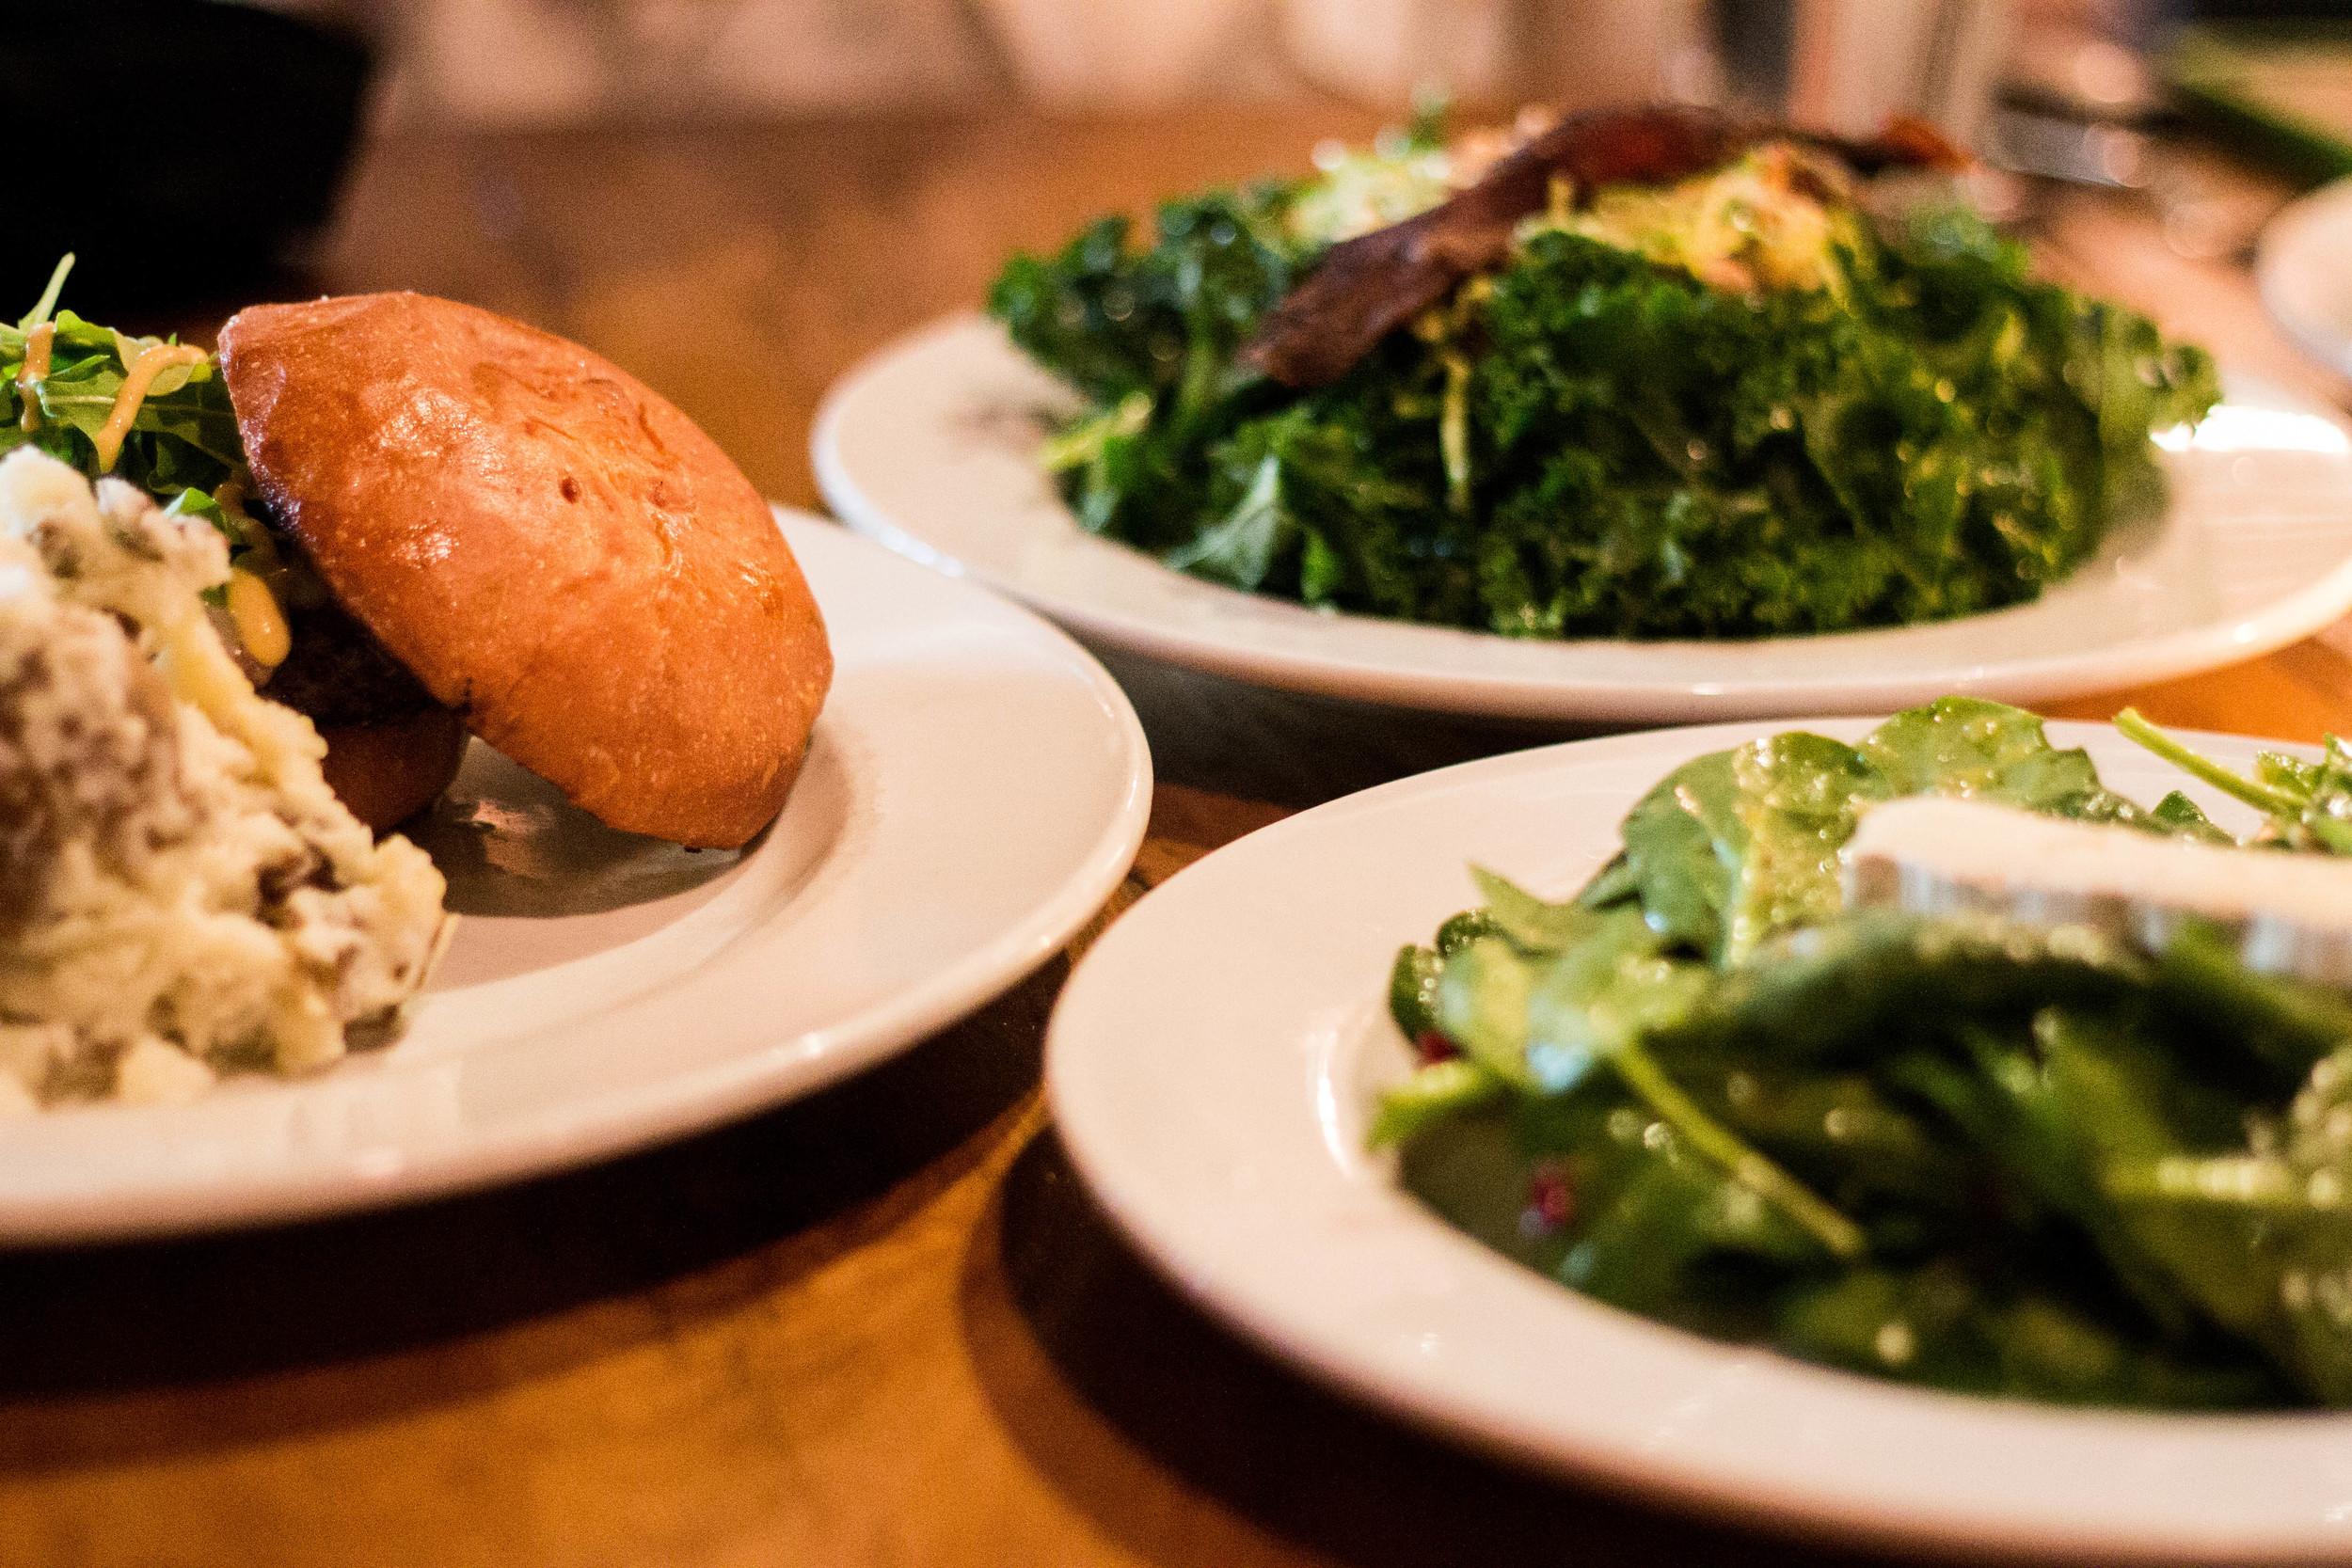 Summit Burger, Spinach Salad, Kale Salad at Westside Local